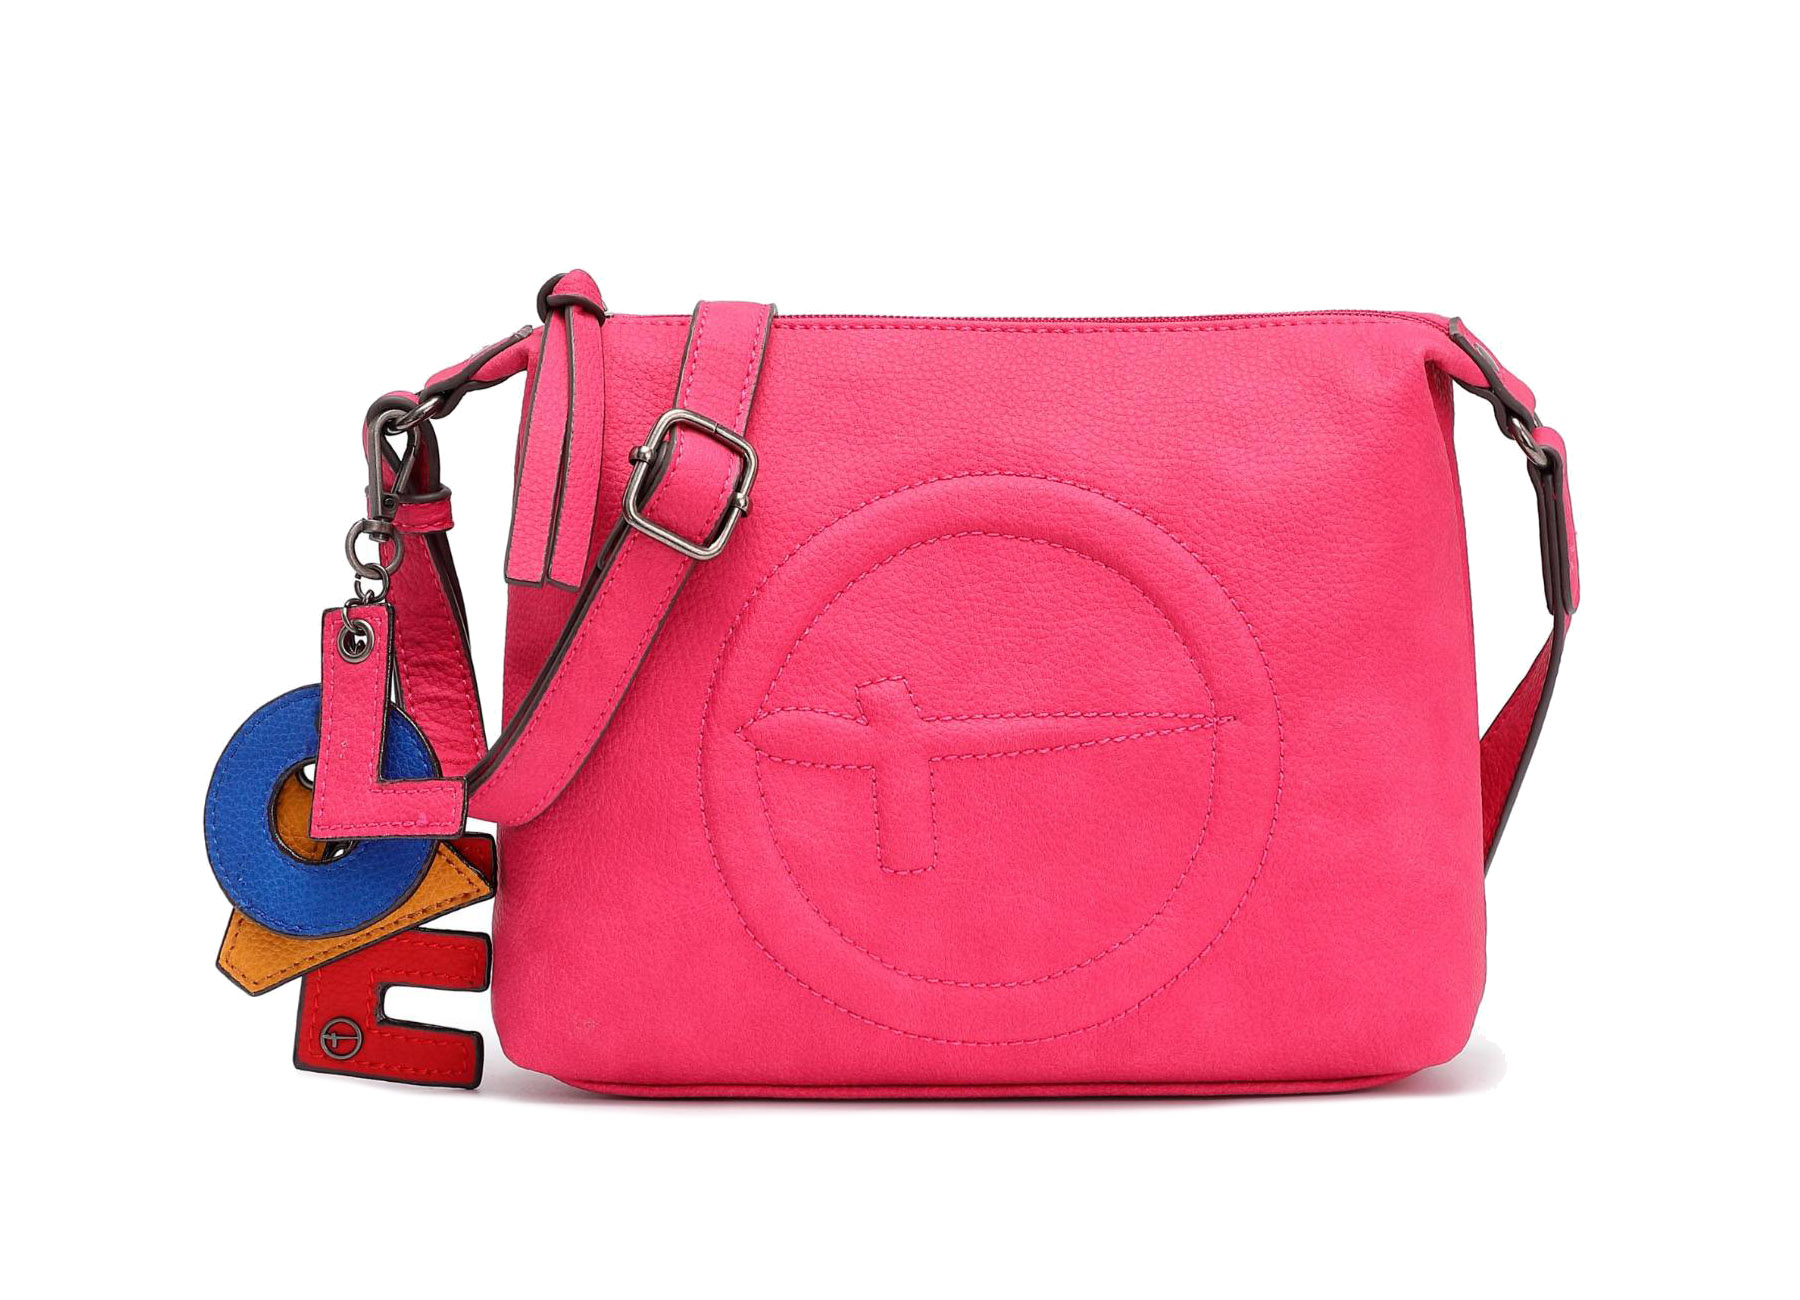 72f73c986d Apostolidishoes Tamaris Fee Crossbody Bag S 3043191-510 Pink (Ροζ)